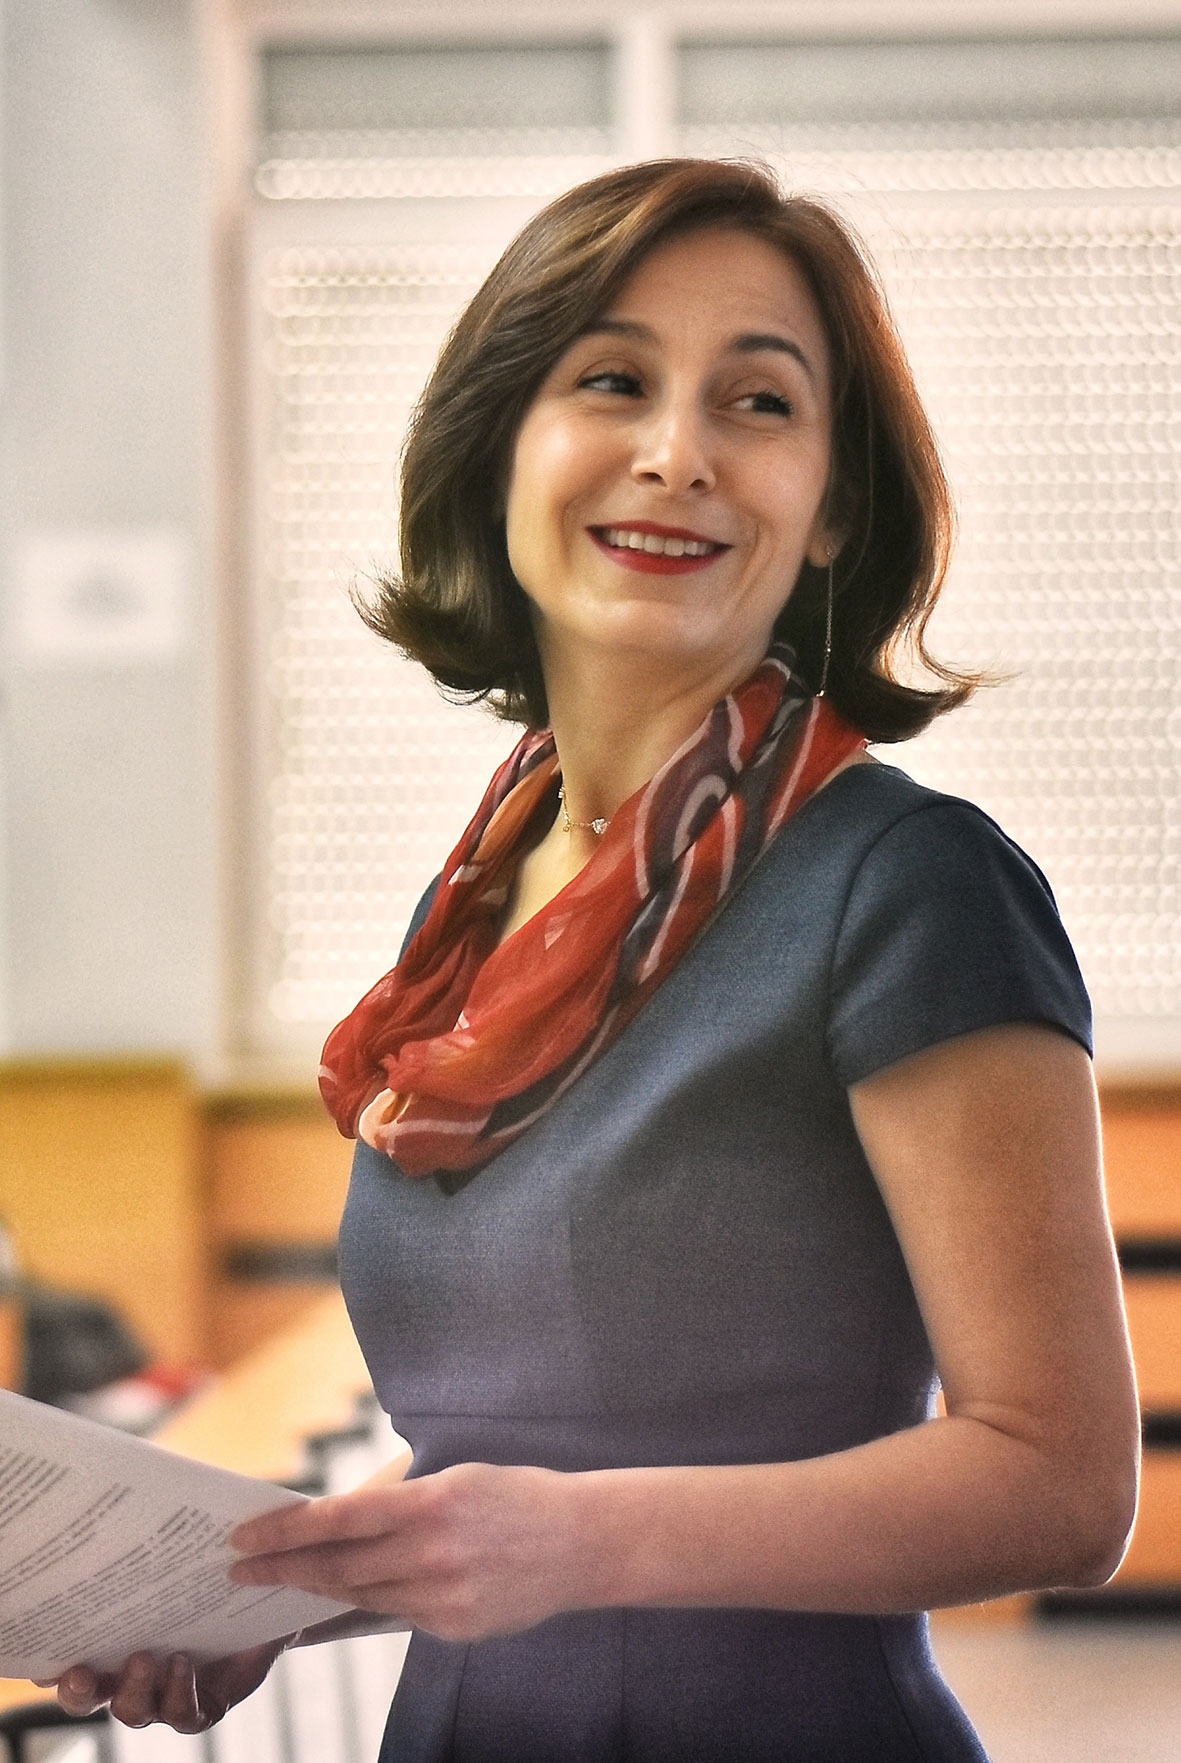 Доц. Д-р Дарина Найденова, диетолог